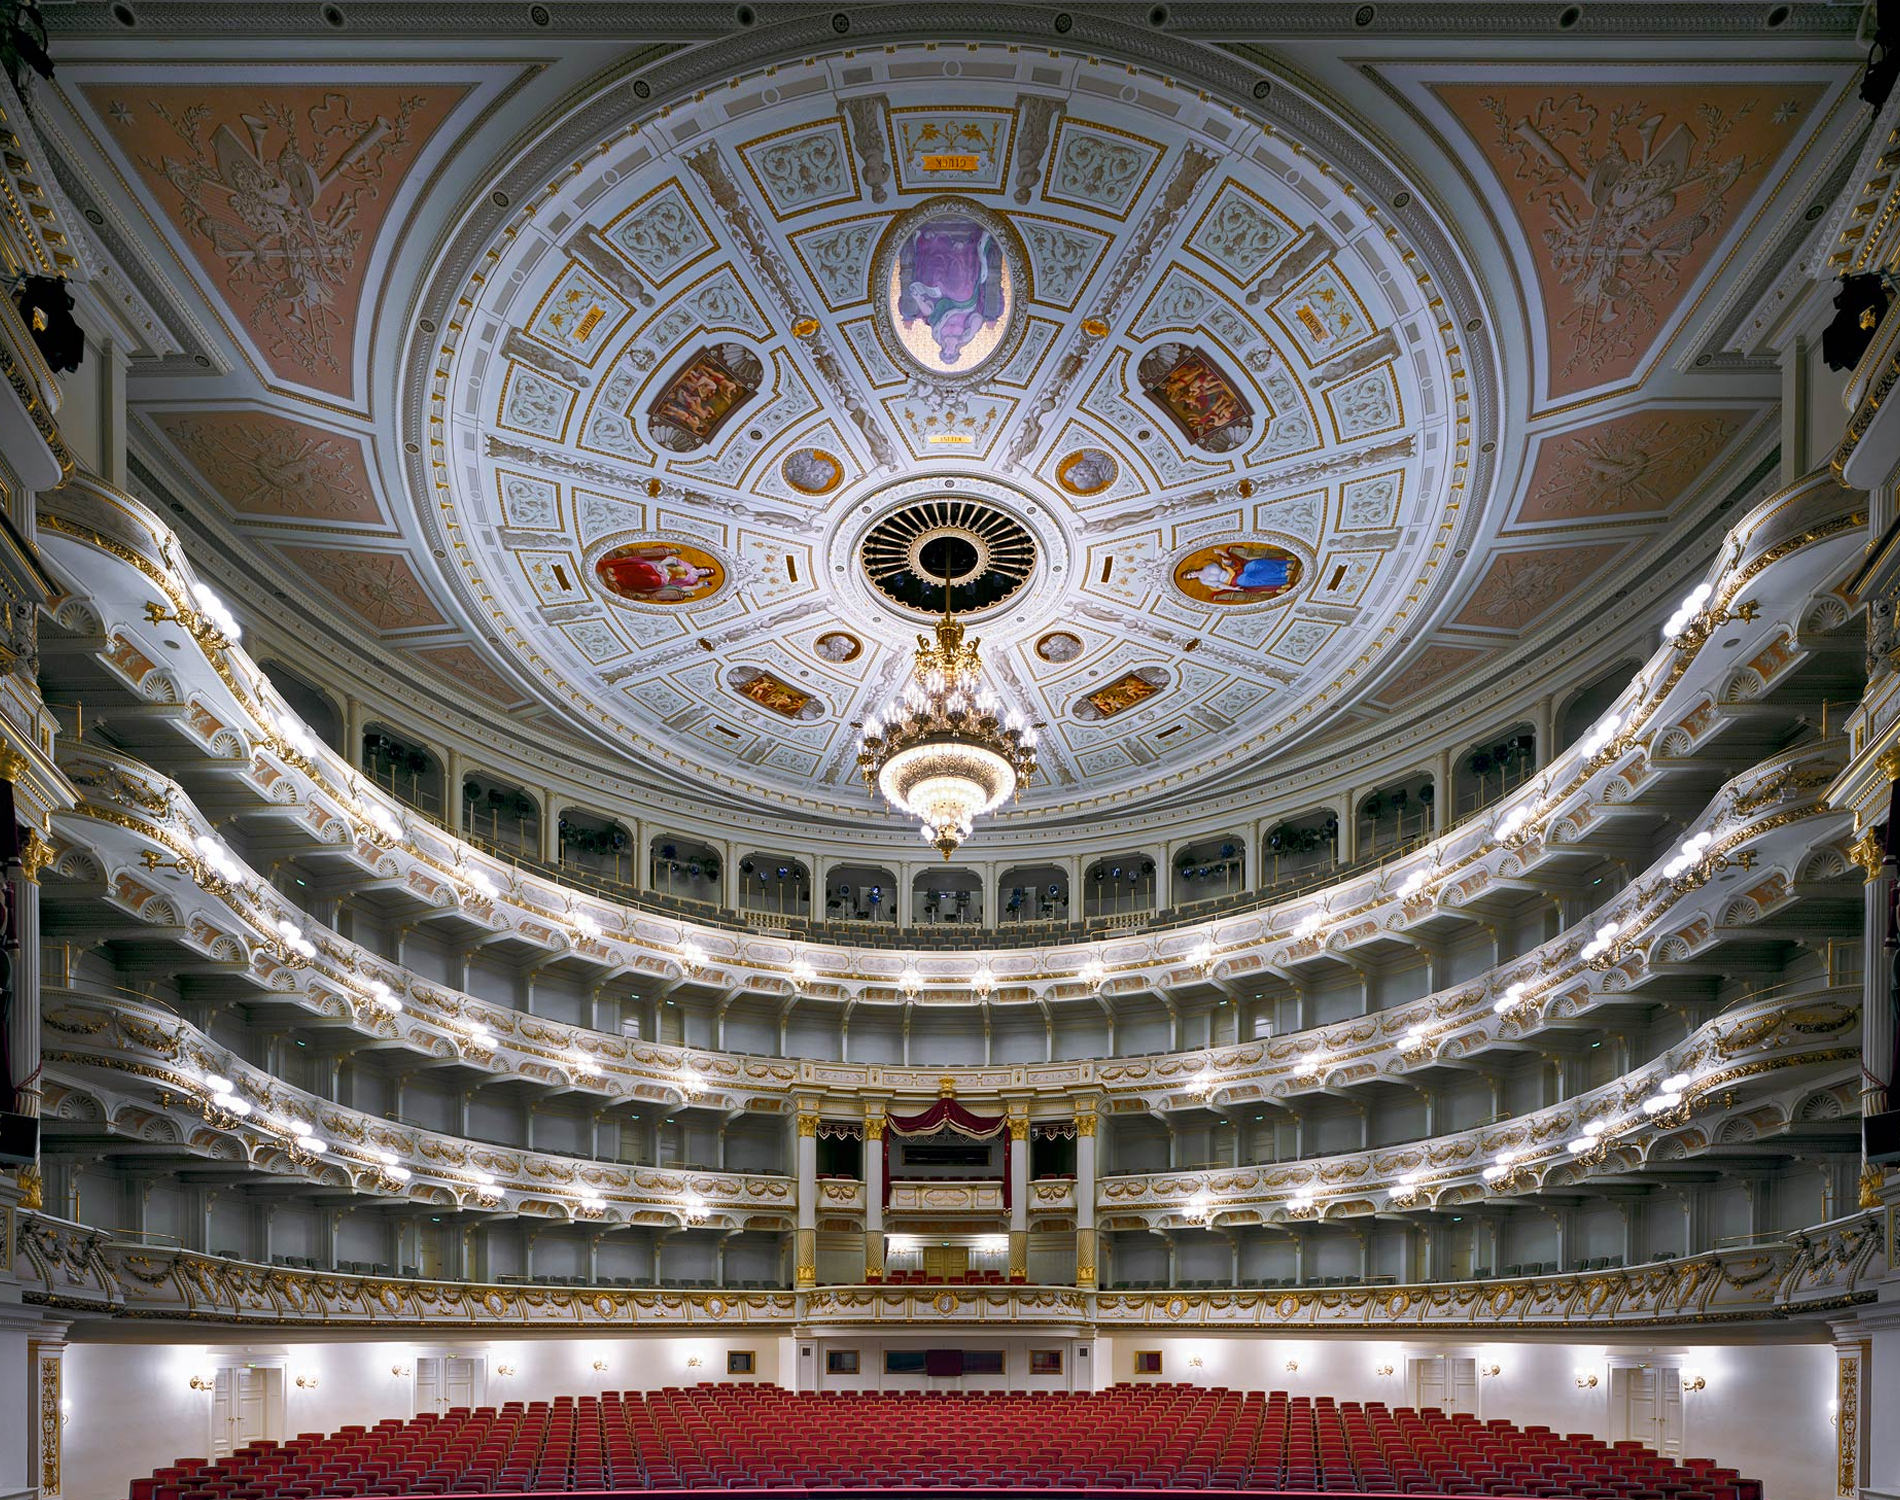 David Leventi Serie Photographie Opera Semperoper Dresde Allemagne 2014